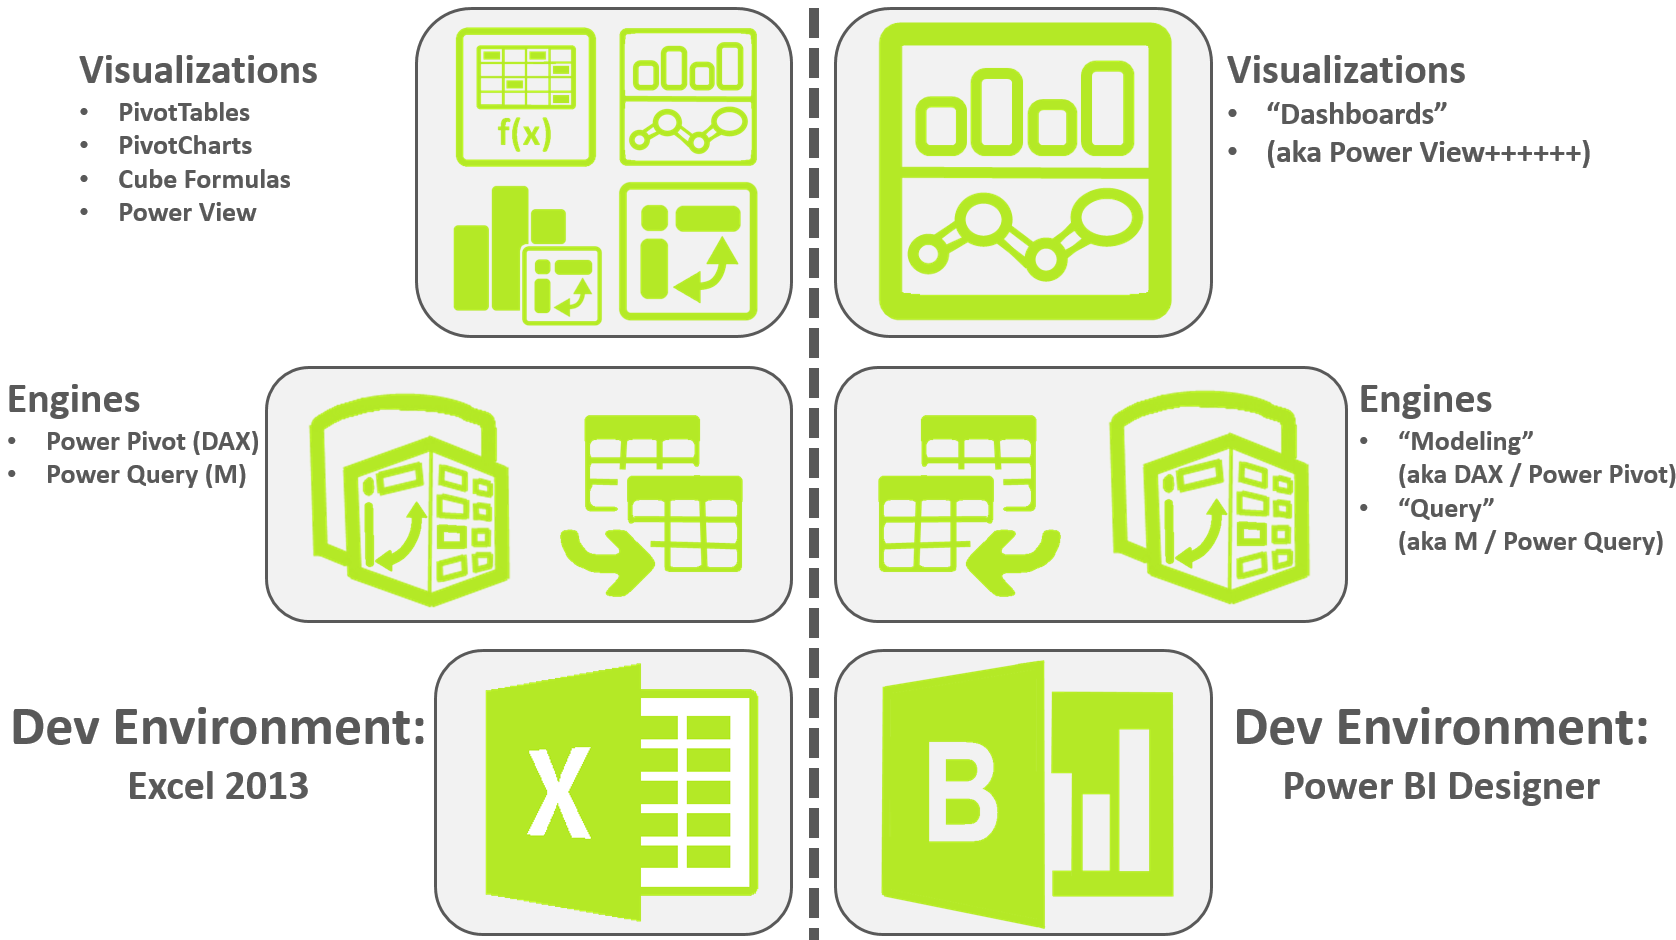 obiee architecture diagram us government checks and balances microsoft bi get free